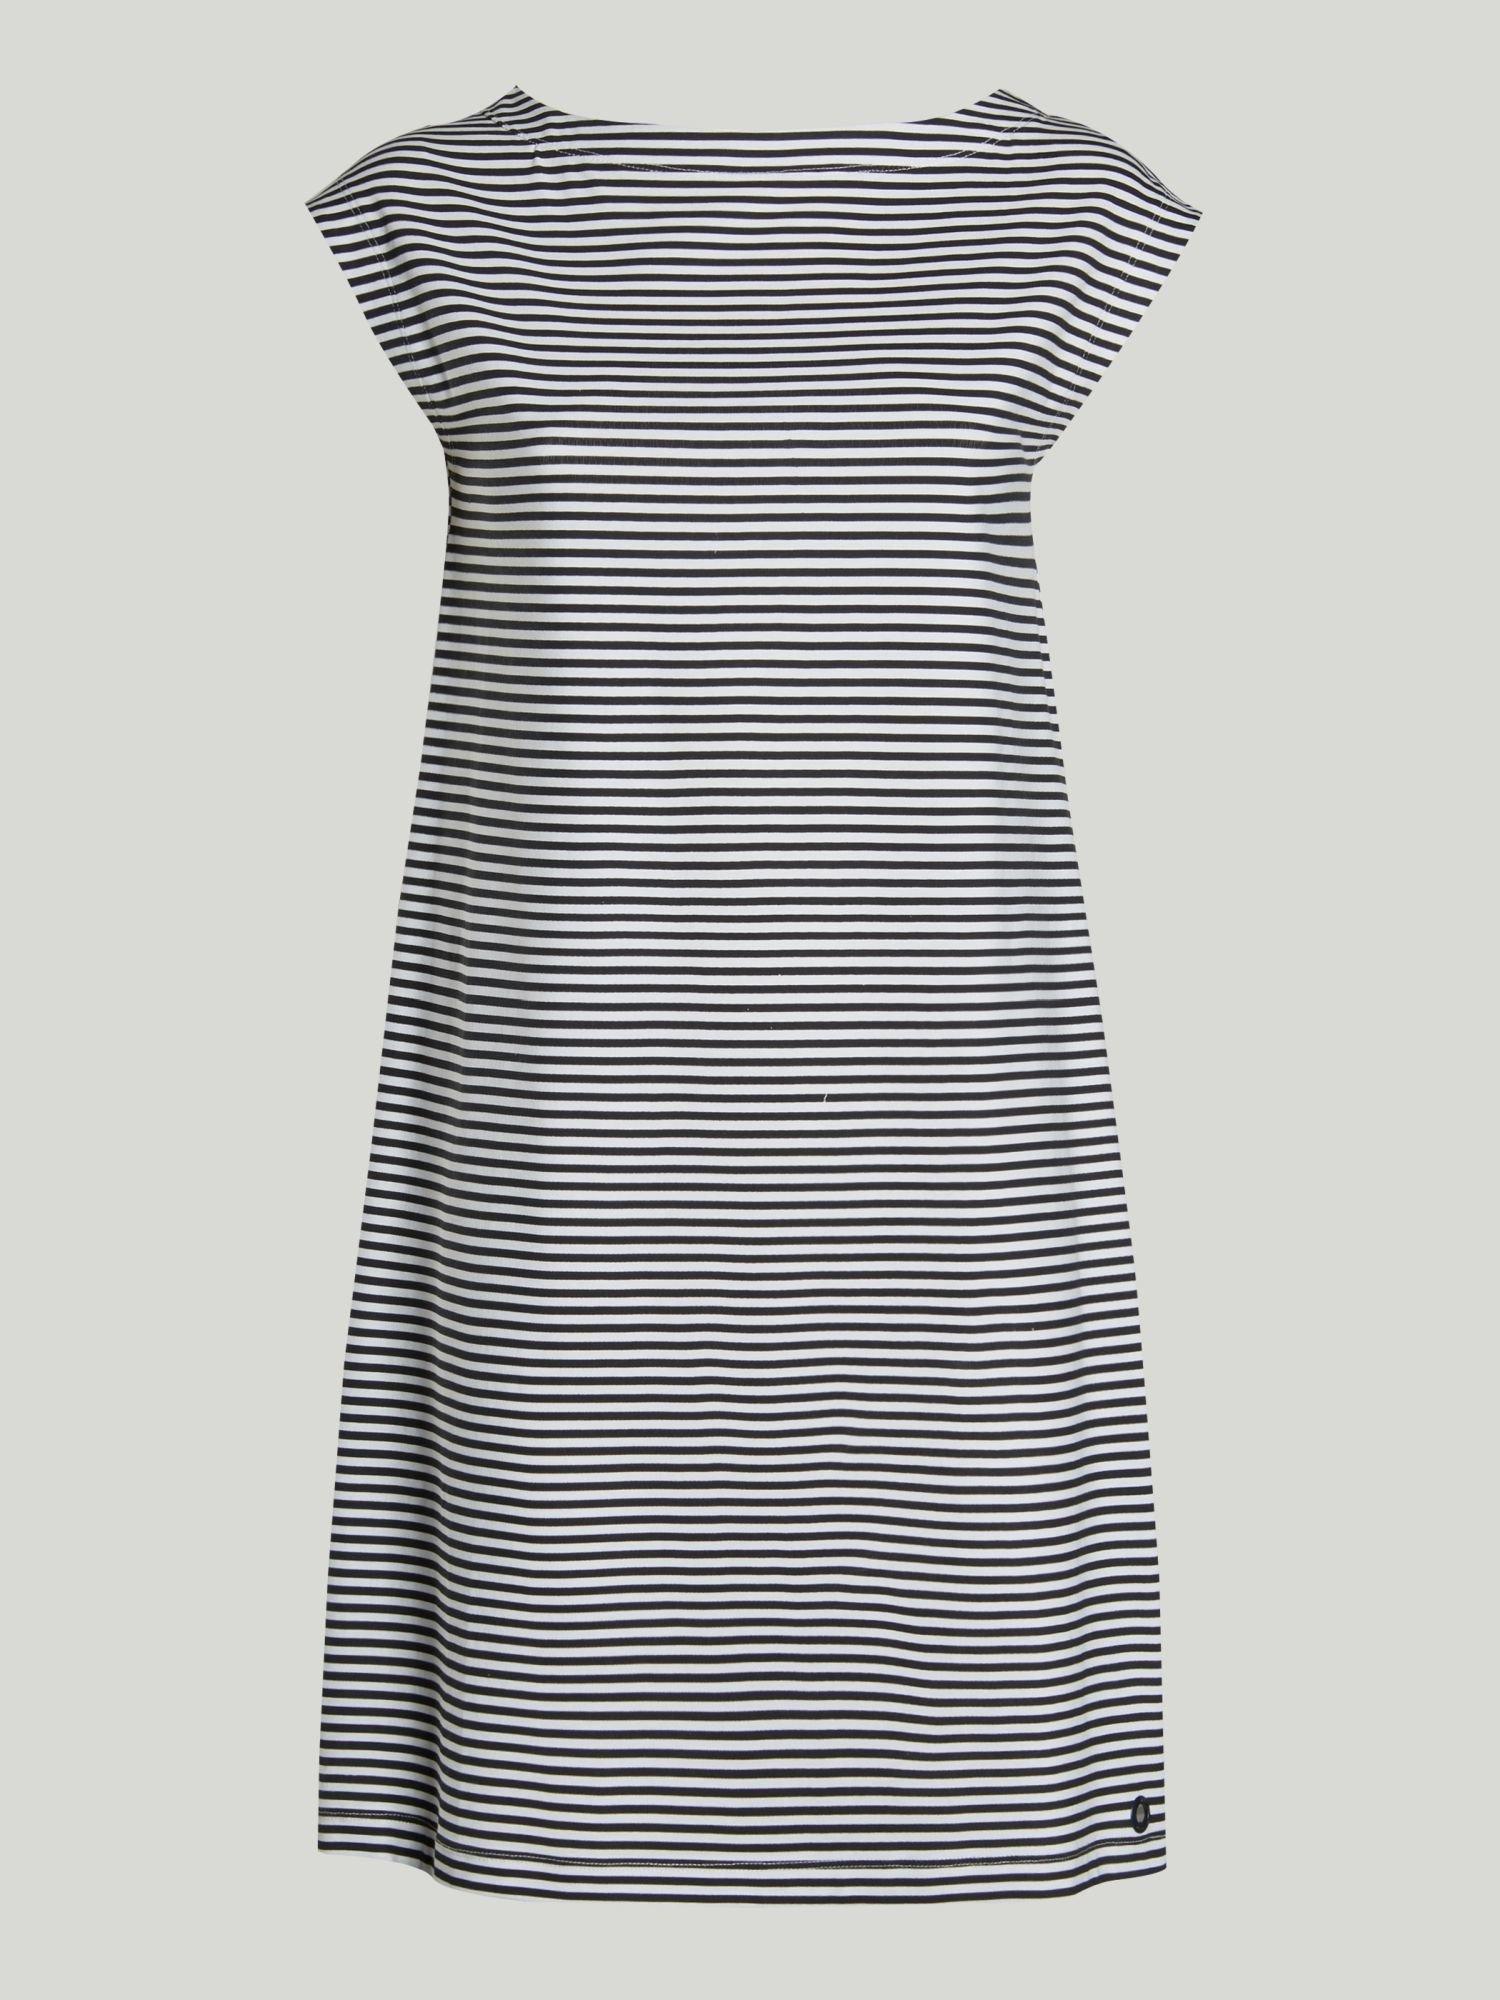 Dress A48 - Navy / Bianco